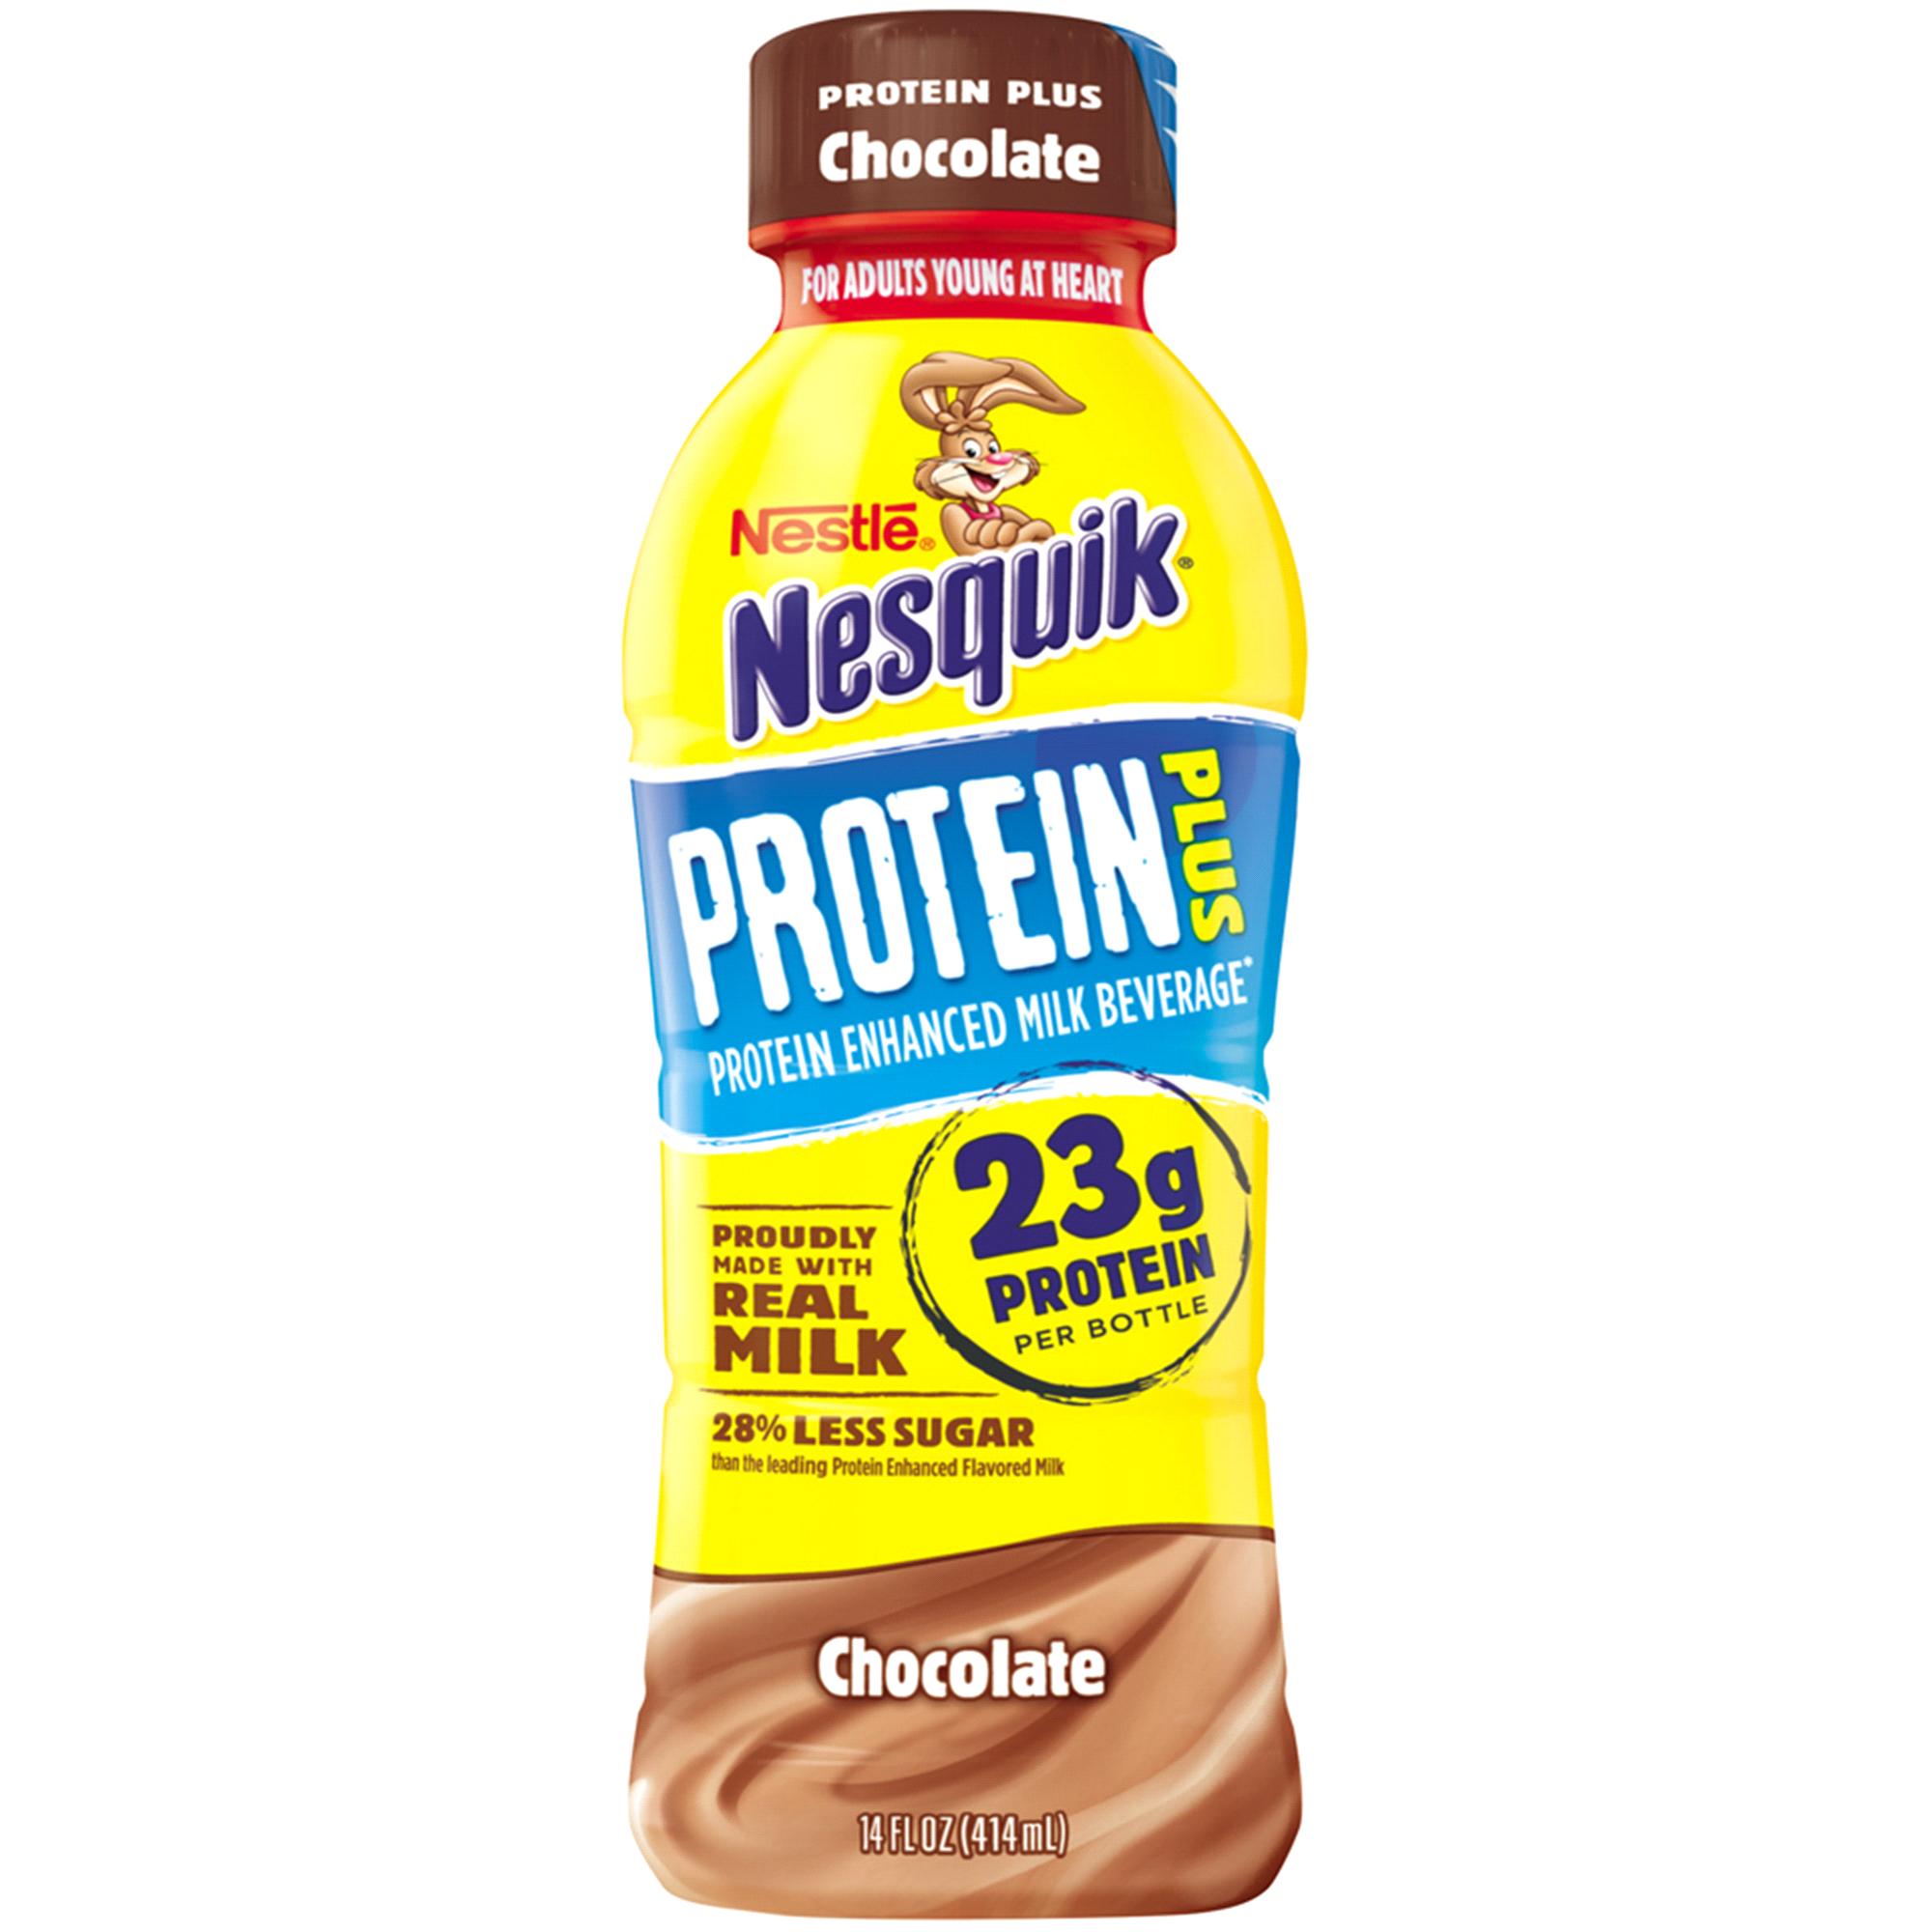 Nestle Nesquik Protein Plus Chocolate Flavored Low Fat Milk 14 oz ...